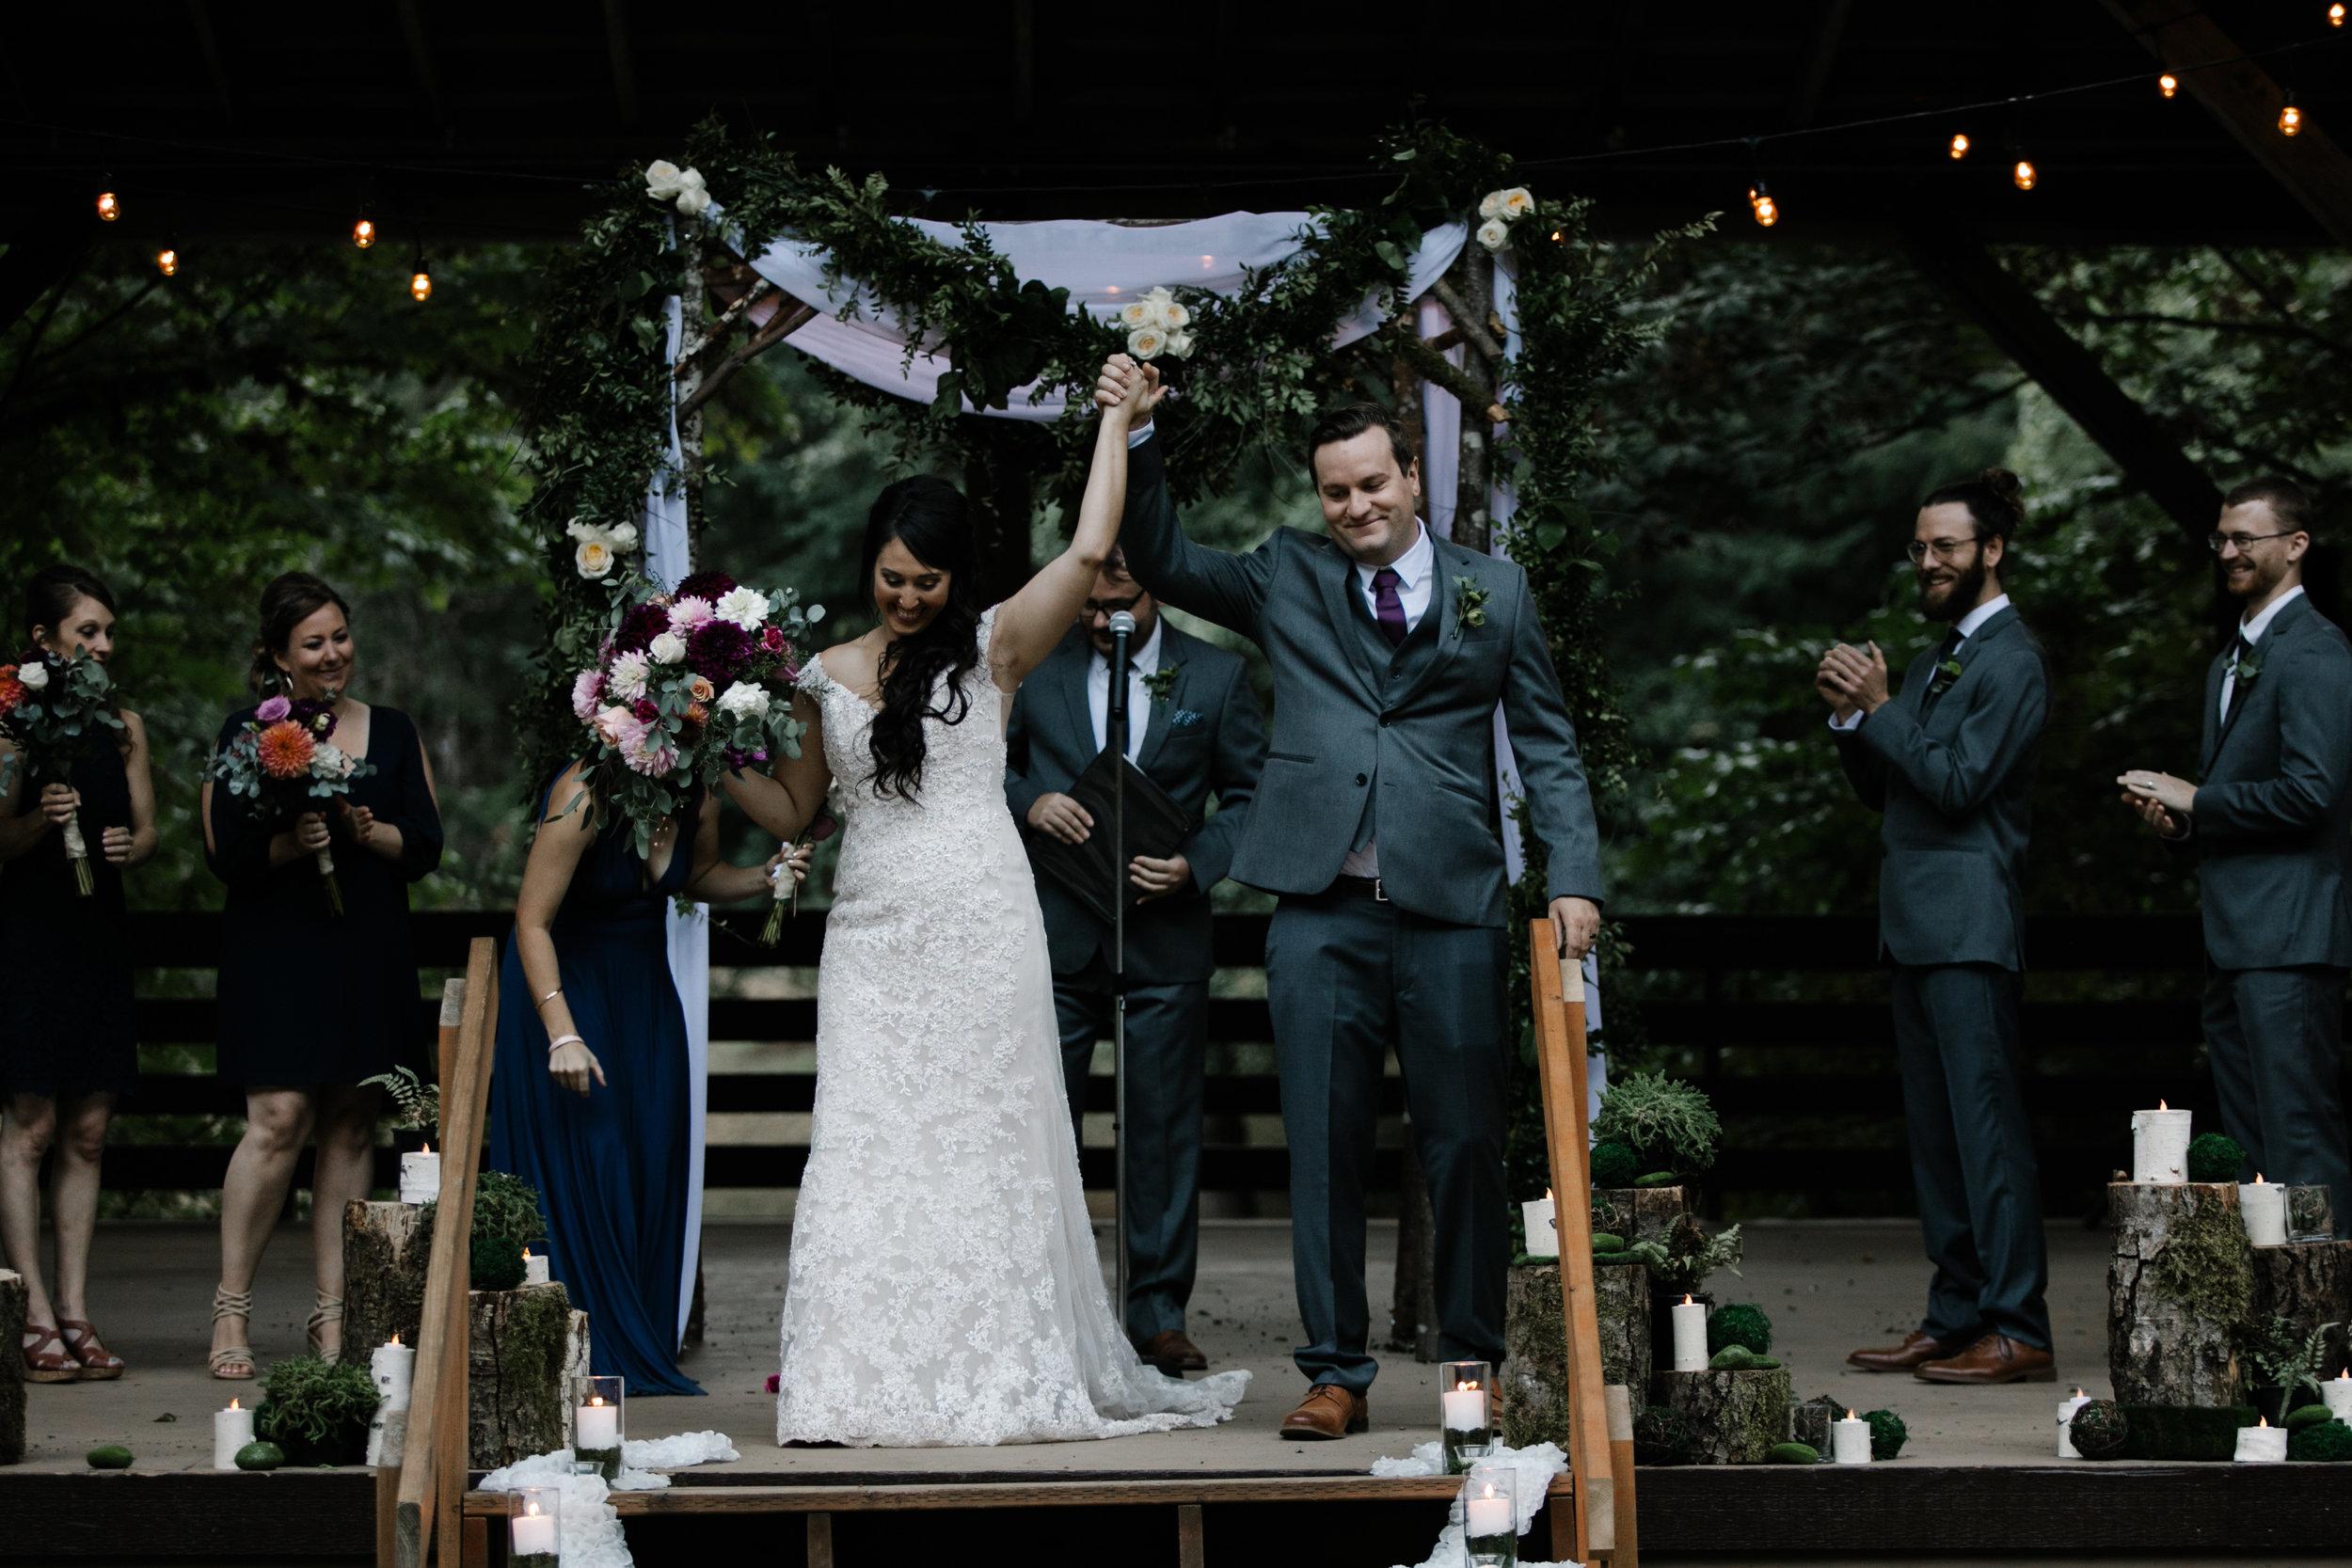 Sevlynn-Photography-Teresa-Chandler-Wedding-56.jpg